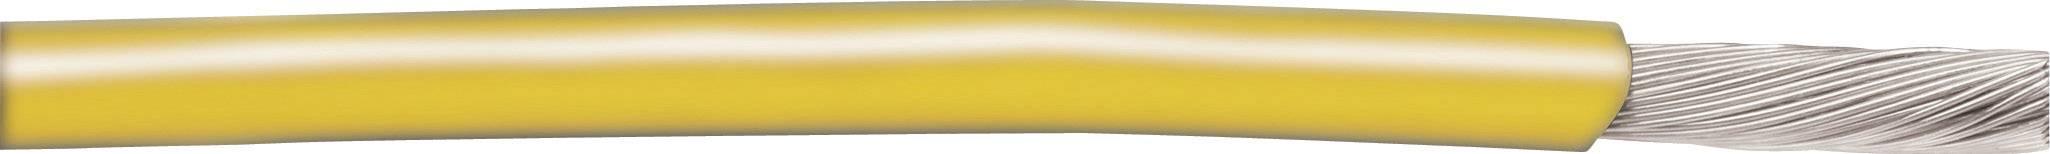 Pletenica EcoWire 1 x 0.08 mm, rumena AlphaWire 6710 30.5 m